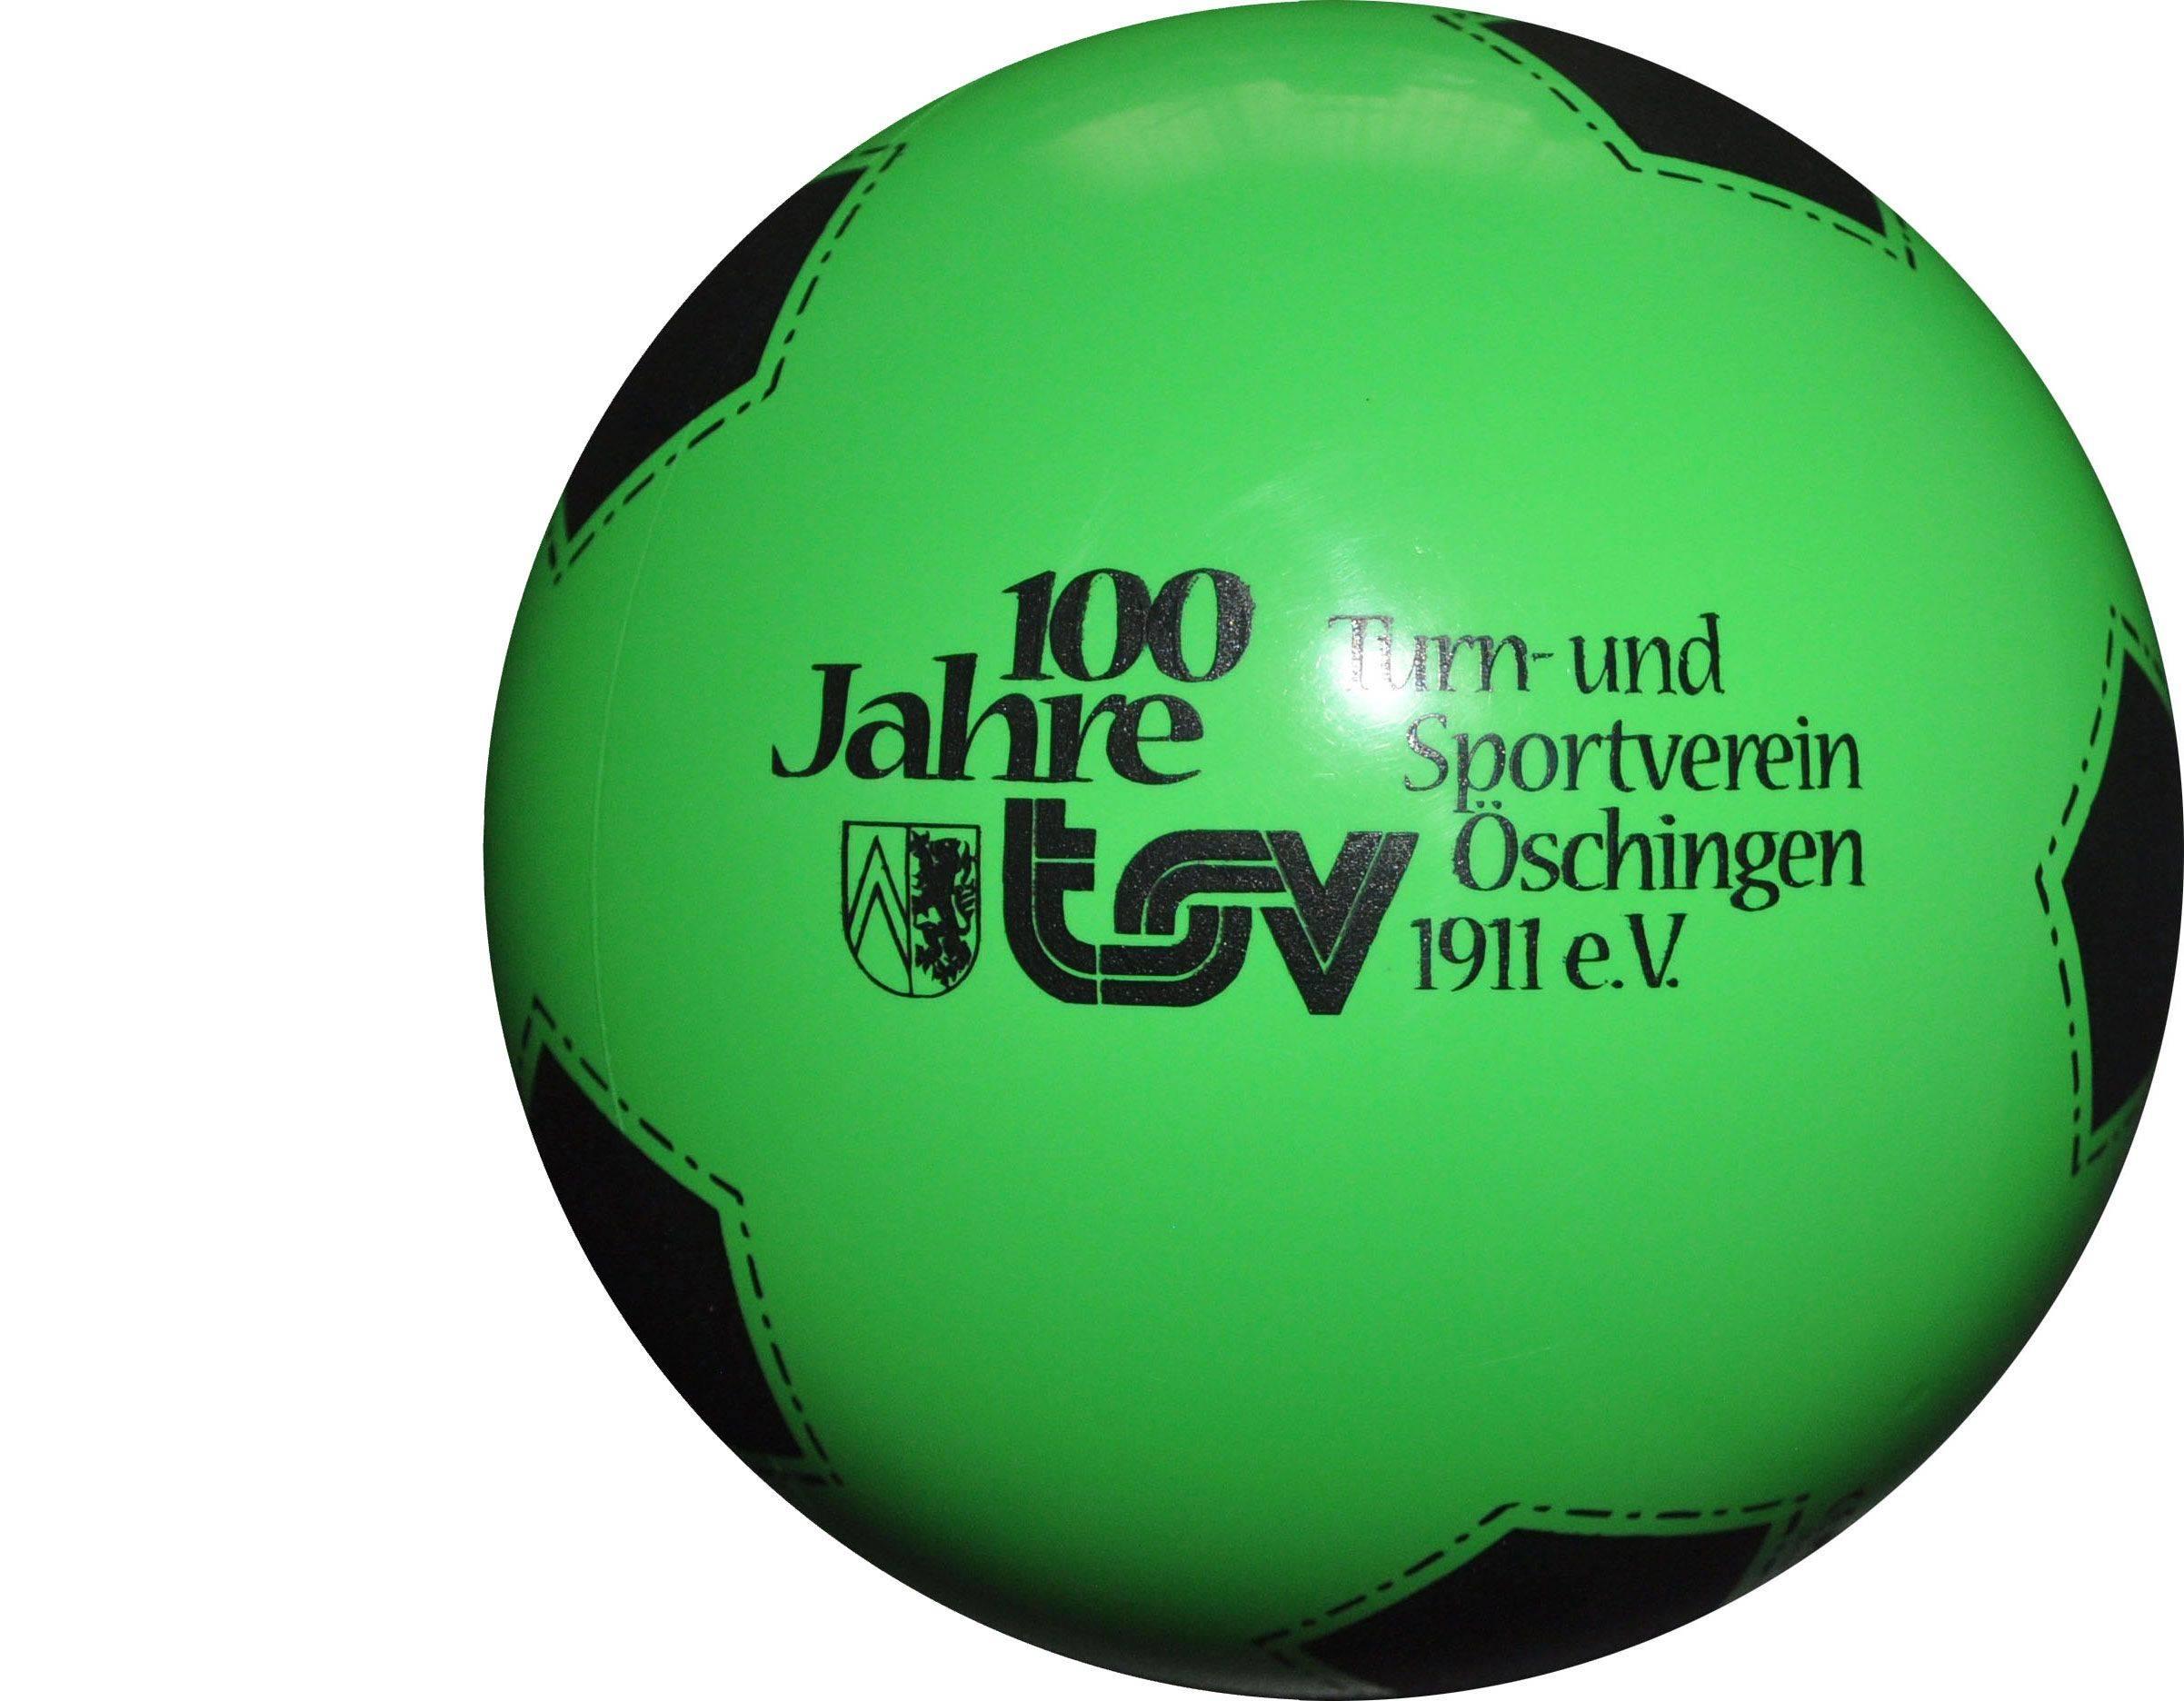 O-schingen-585010021